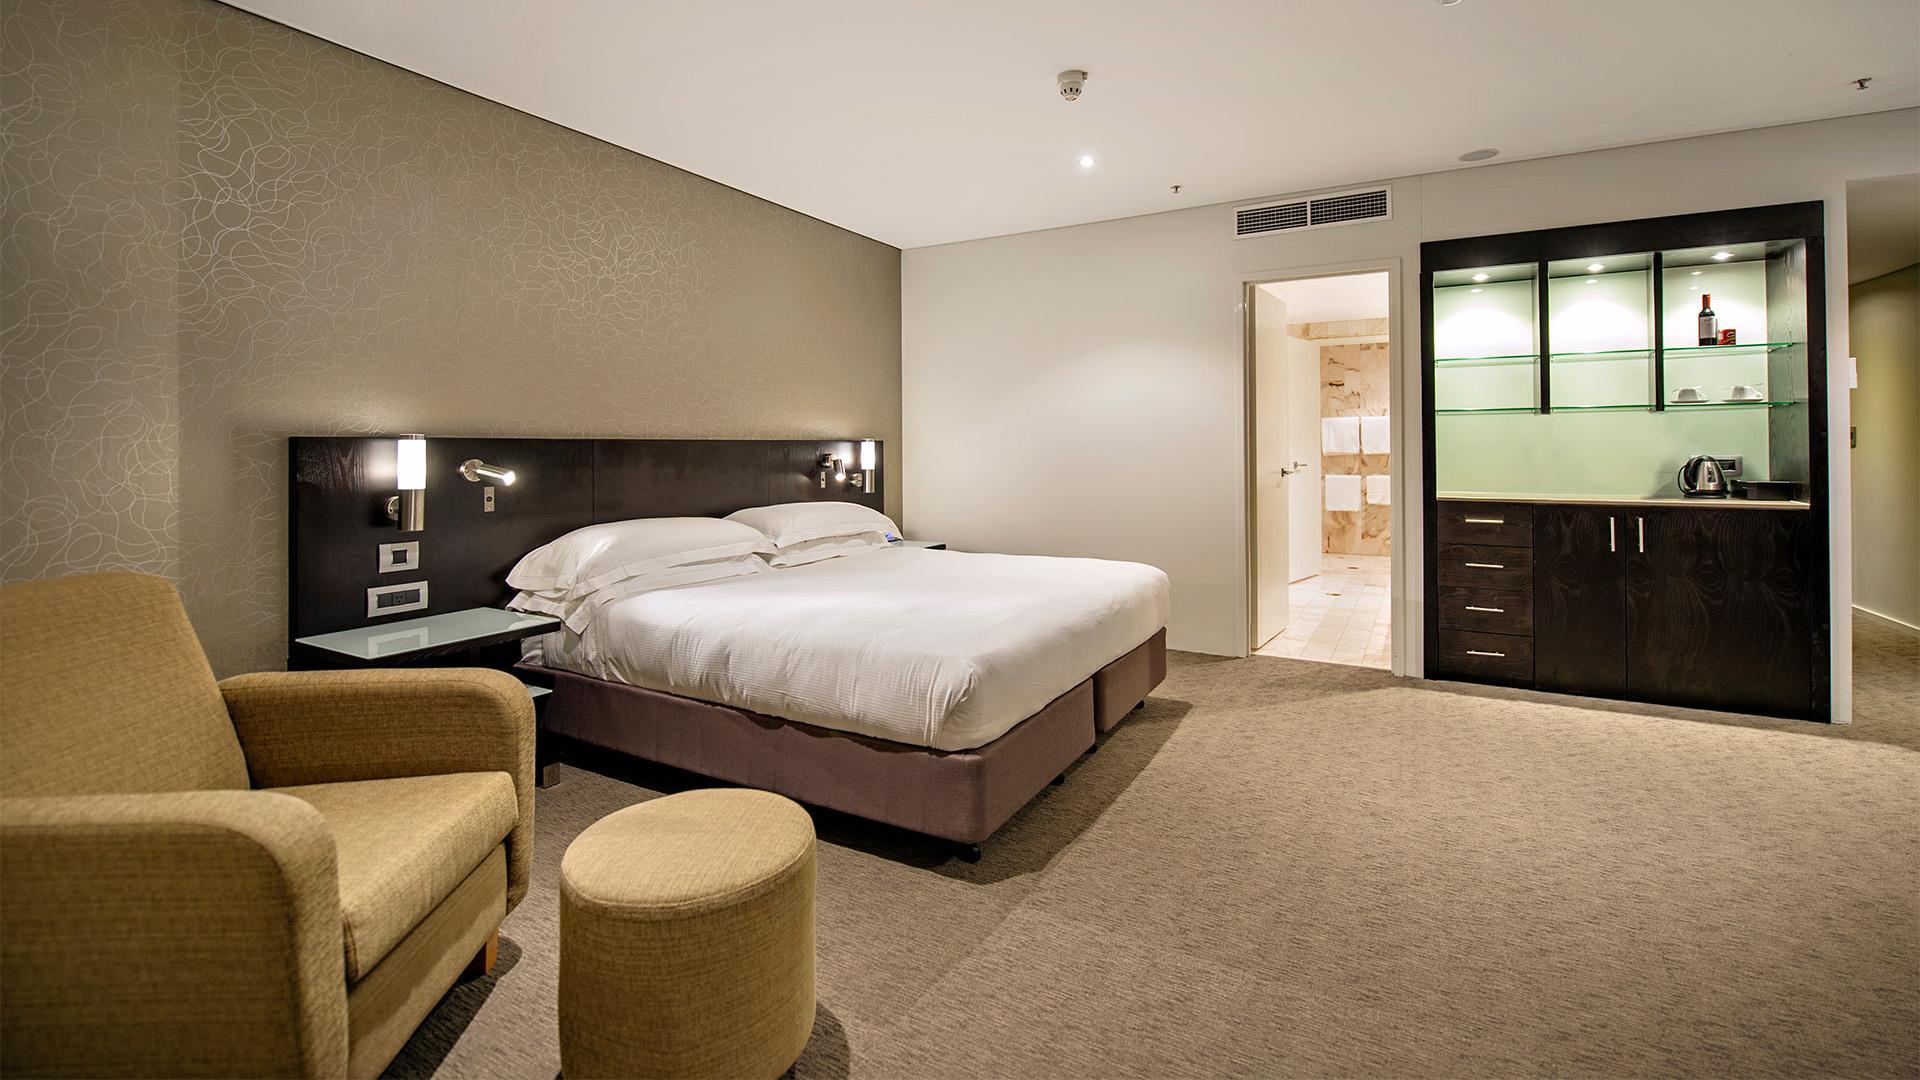 King Guest Room image 1 at Hilton Darwin by Darwin Municipality, Northern Territory, Australia